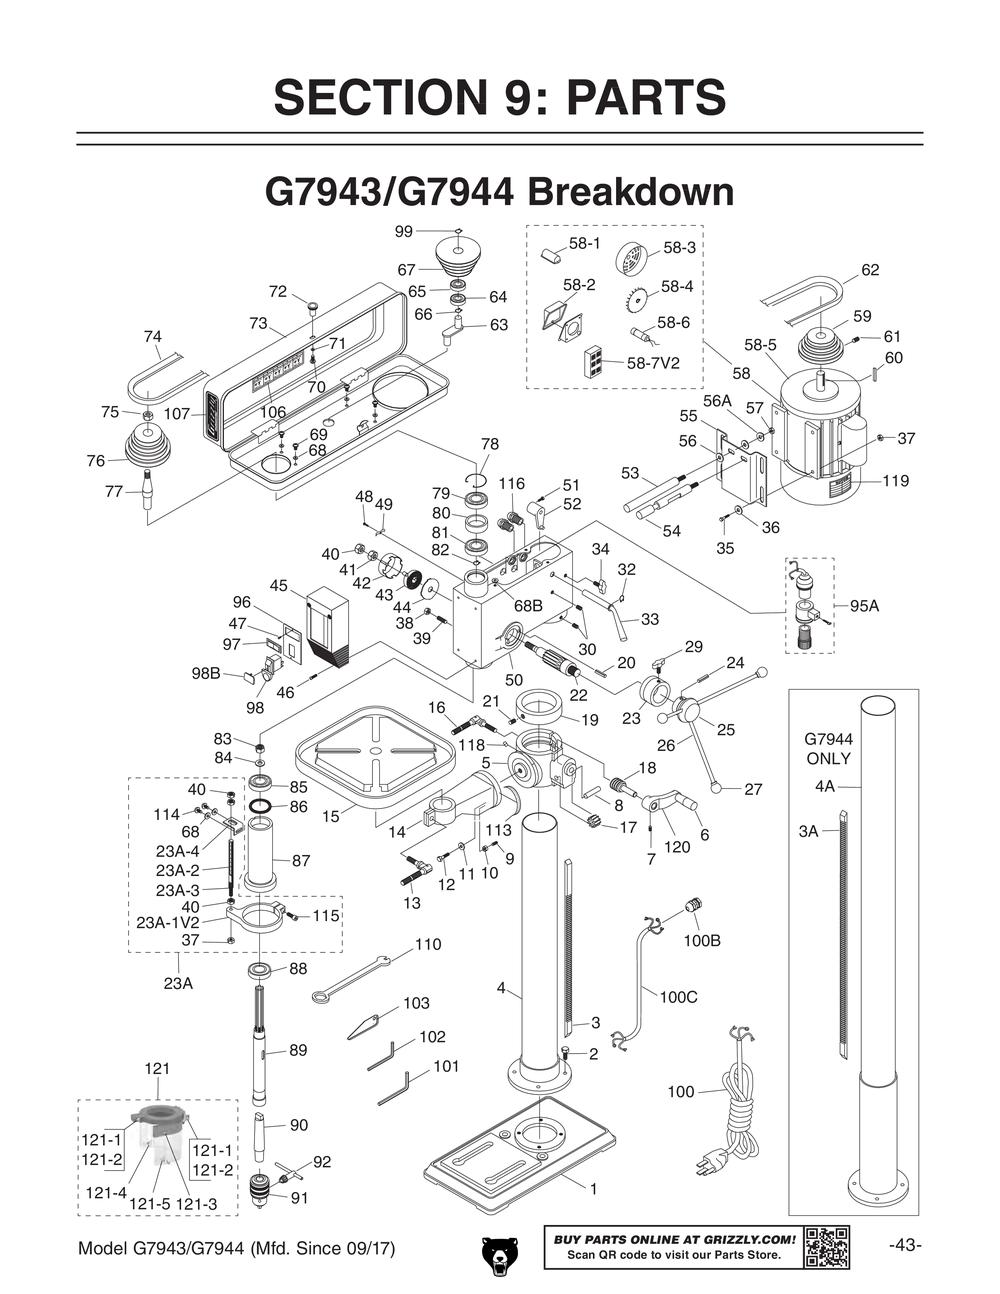 Fine galvanized wire gauge chart vignette wiring diagram ideas exelent drill bit wire gauge chart picture collection wiring greentooth Gallery